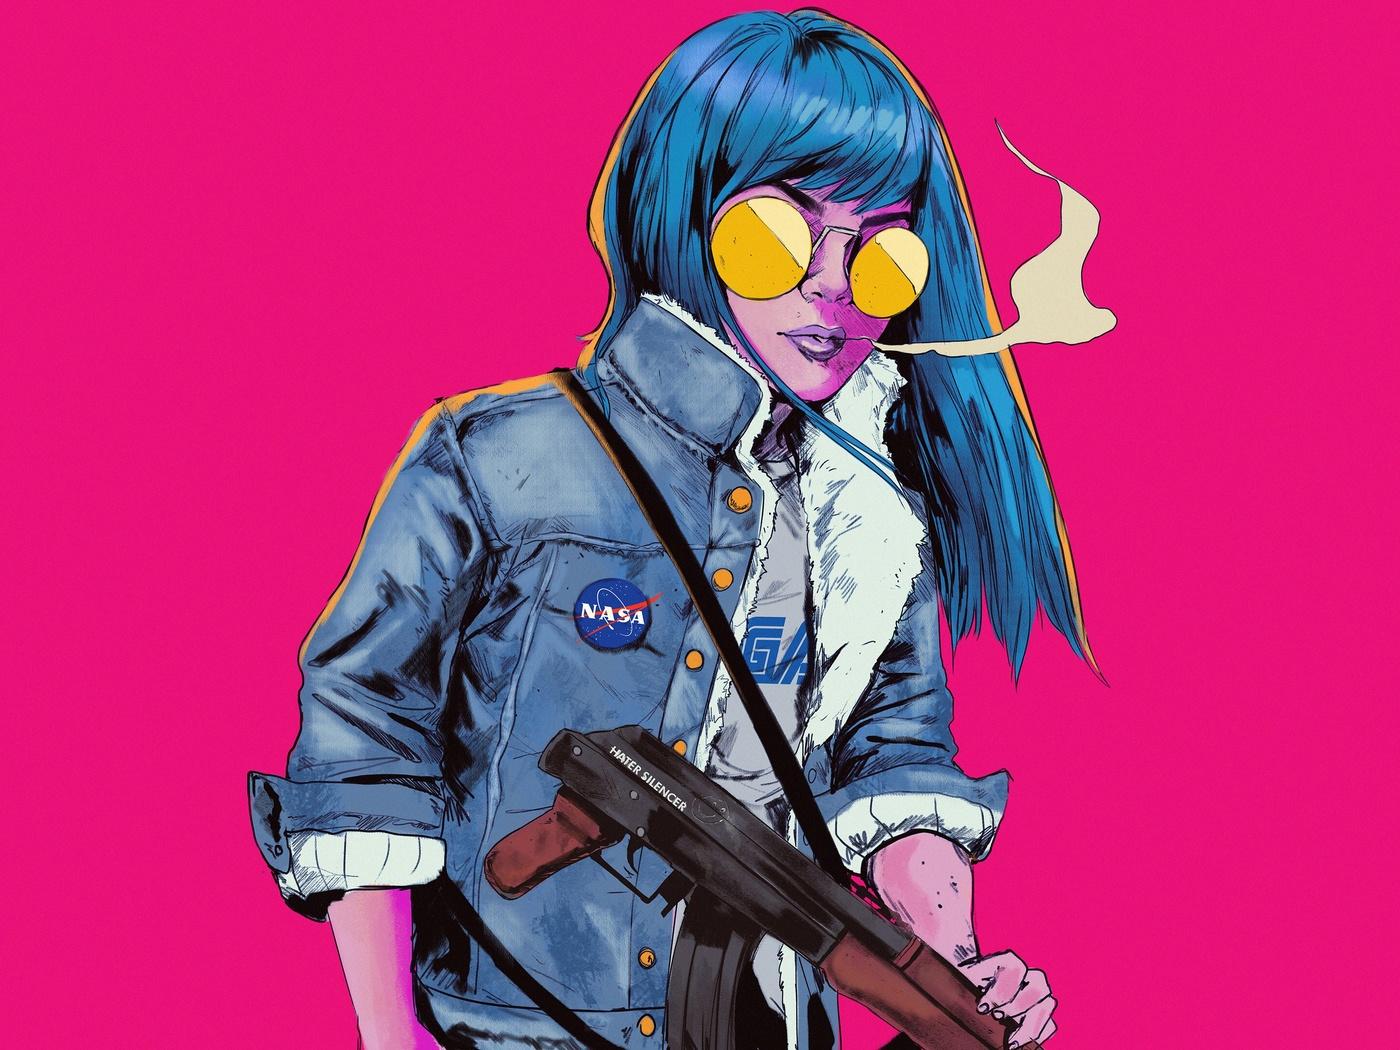 women-abstract-with-ak74-gun-4k-el.jpg